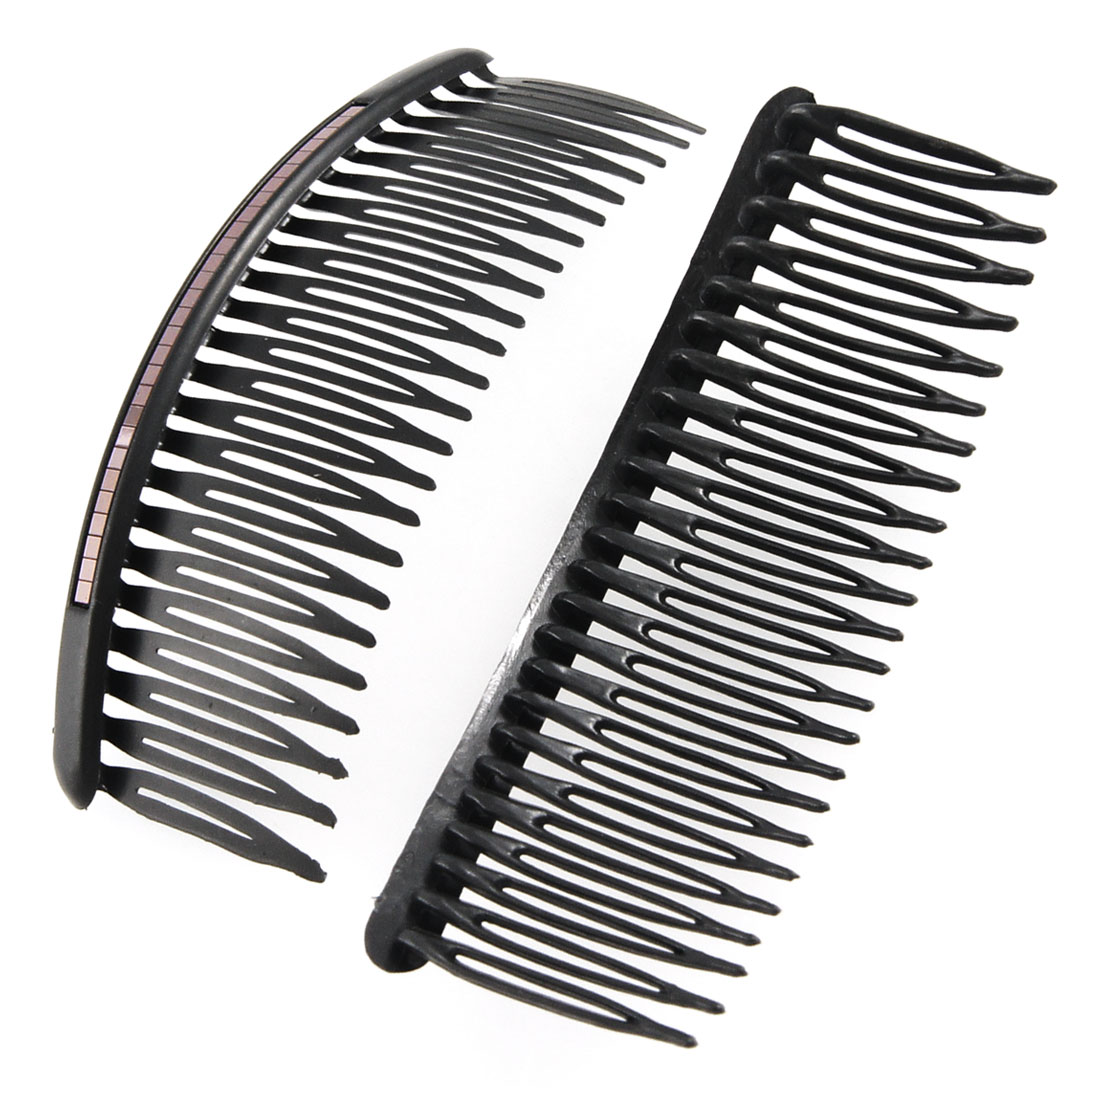 2 Pcs Black Glittery Sheet Inlaid Plastic Comb Hair Pin Clip for Women